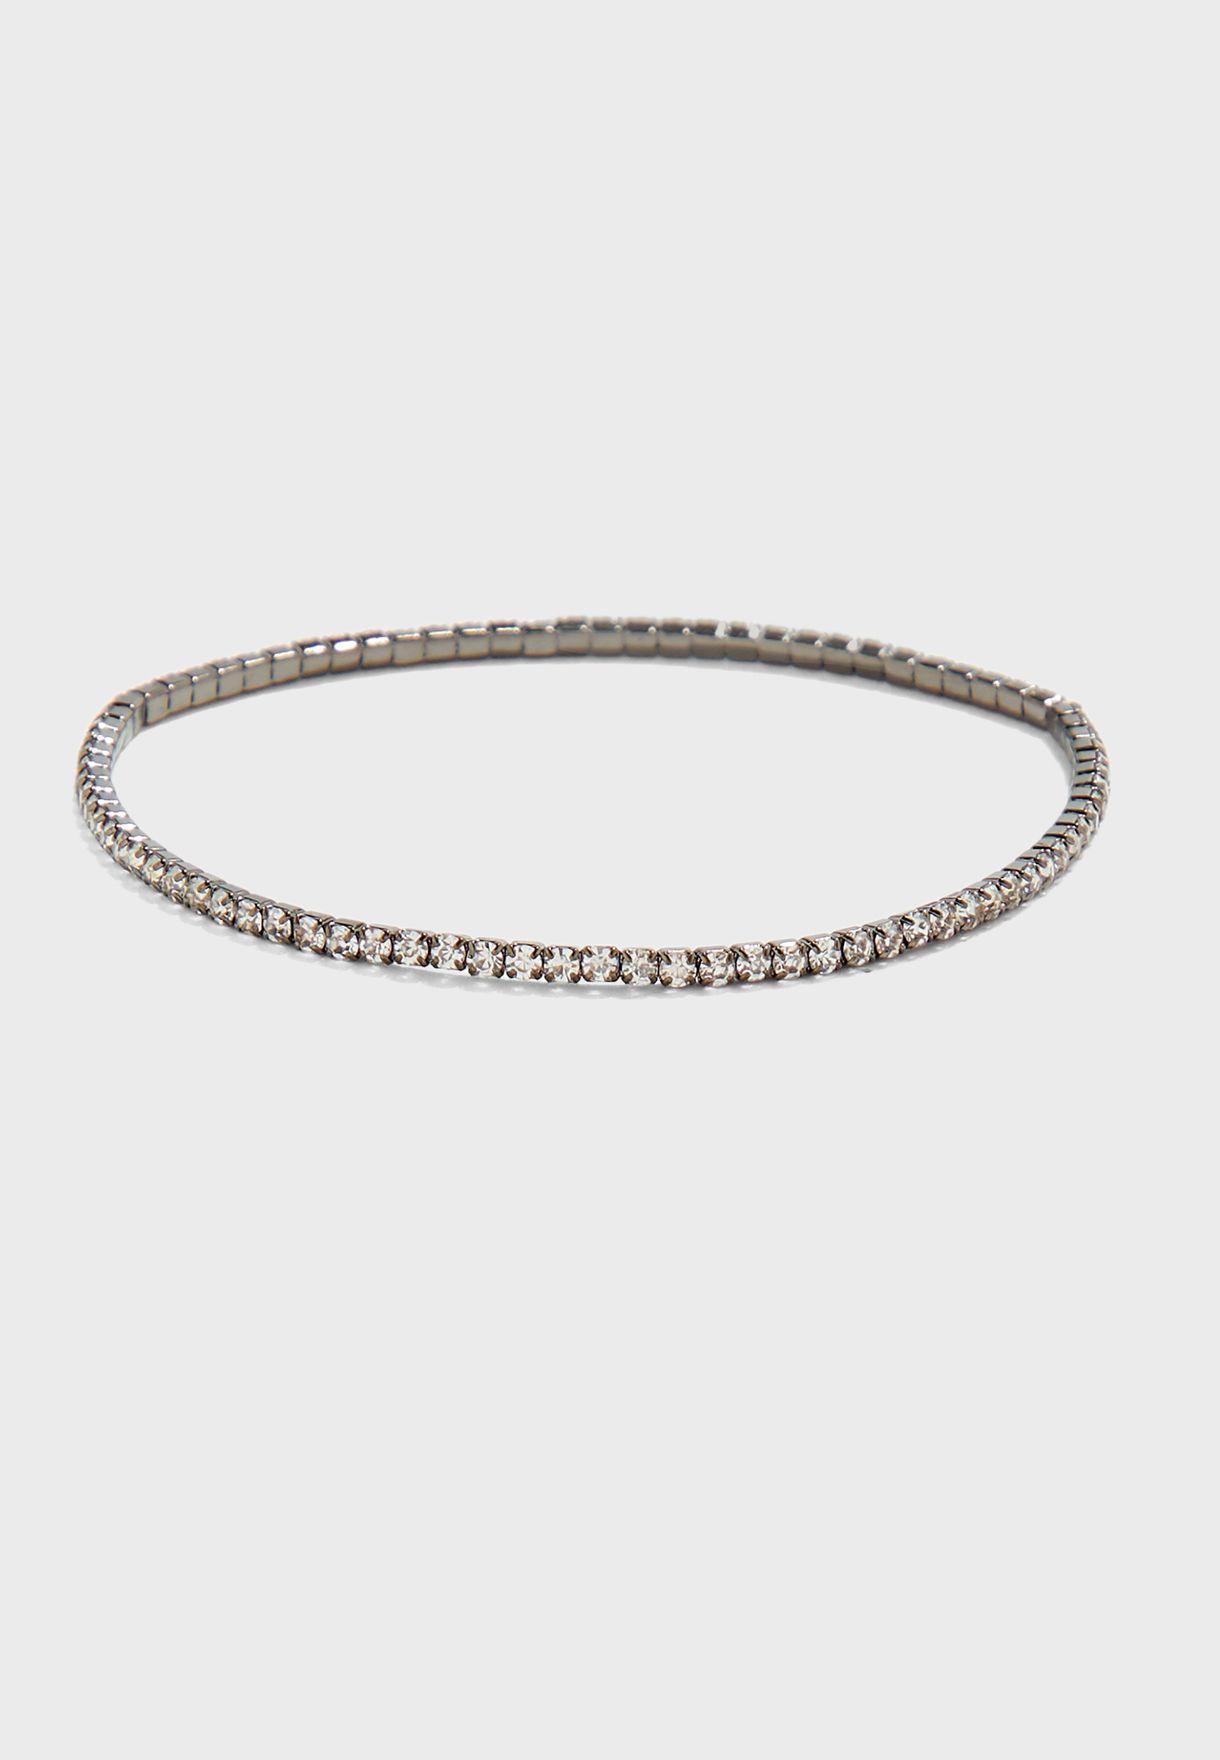 Barrel Stone Beaded Bracelet